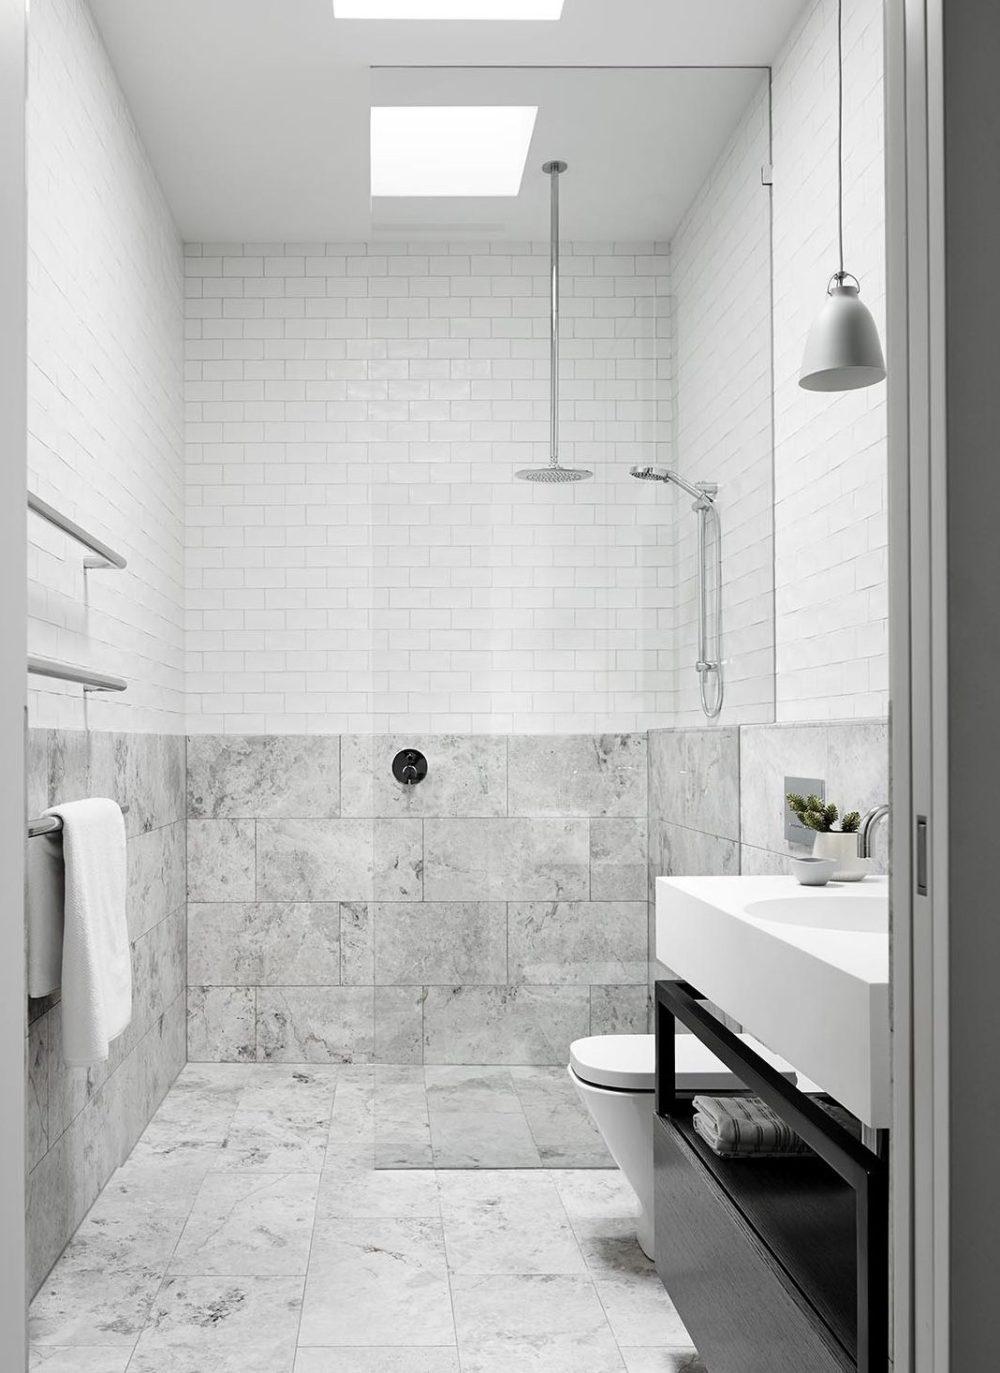 tiled shower base